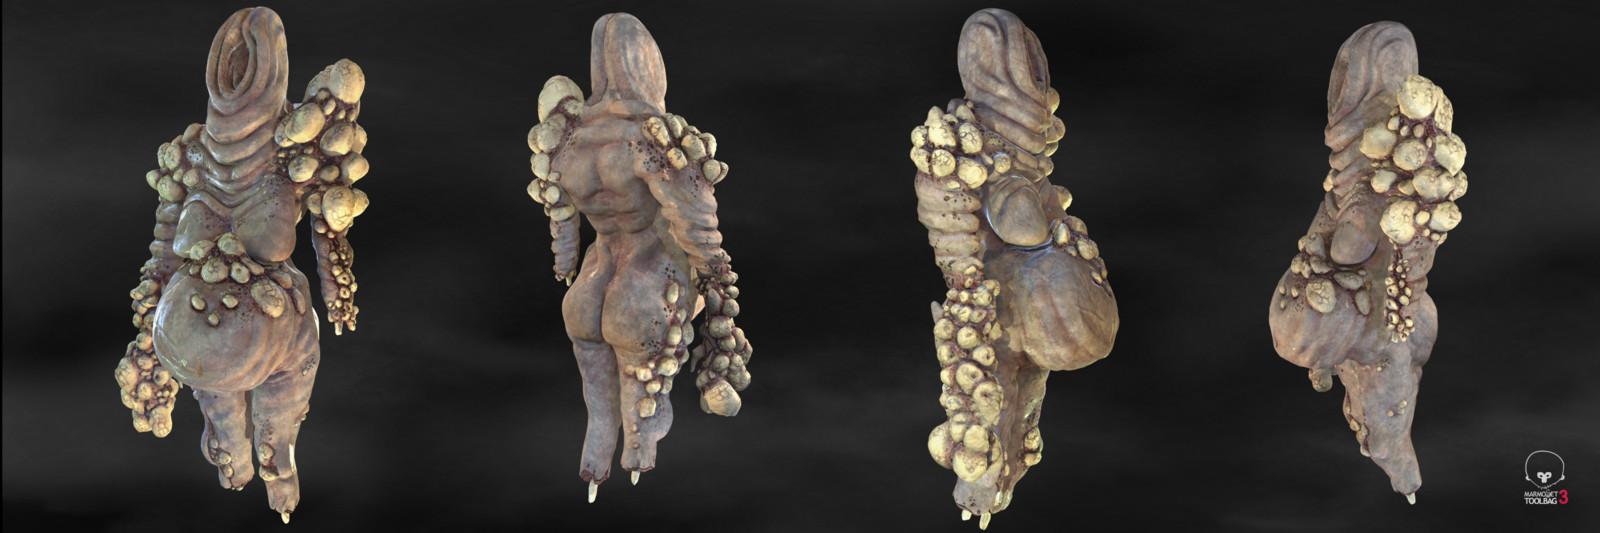 Willendorf (parasite) Zbrush, 2019